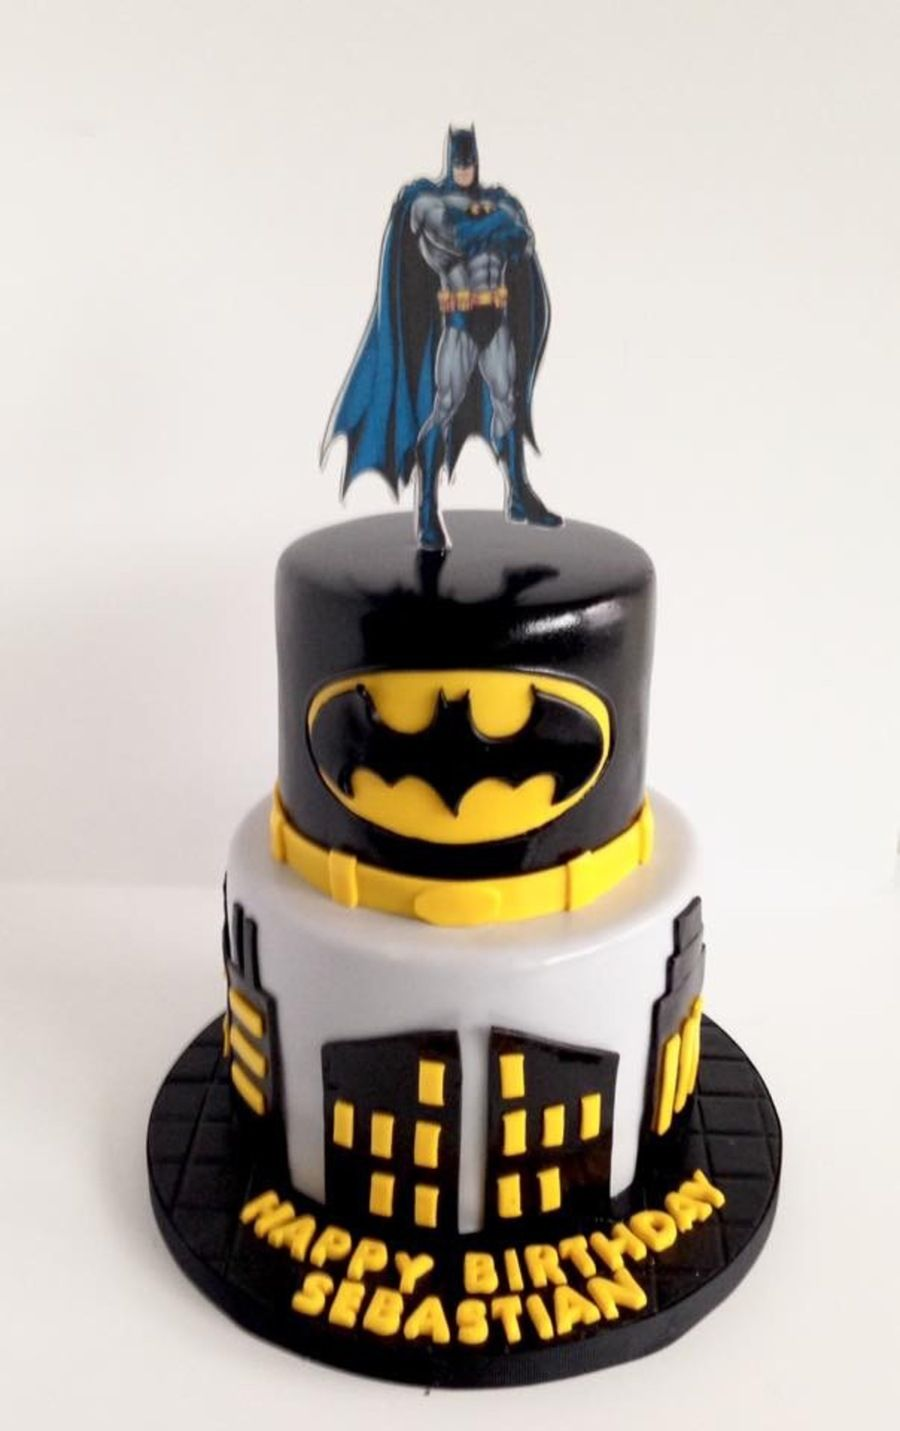 Pleasing Batman With Images Batman Birthday Cakes Batman Cakes Funny Birthday Cards Online Alyptdamsfinfo